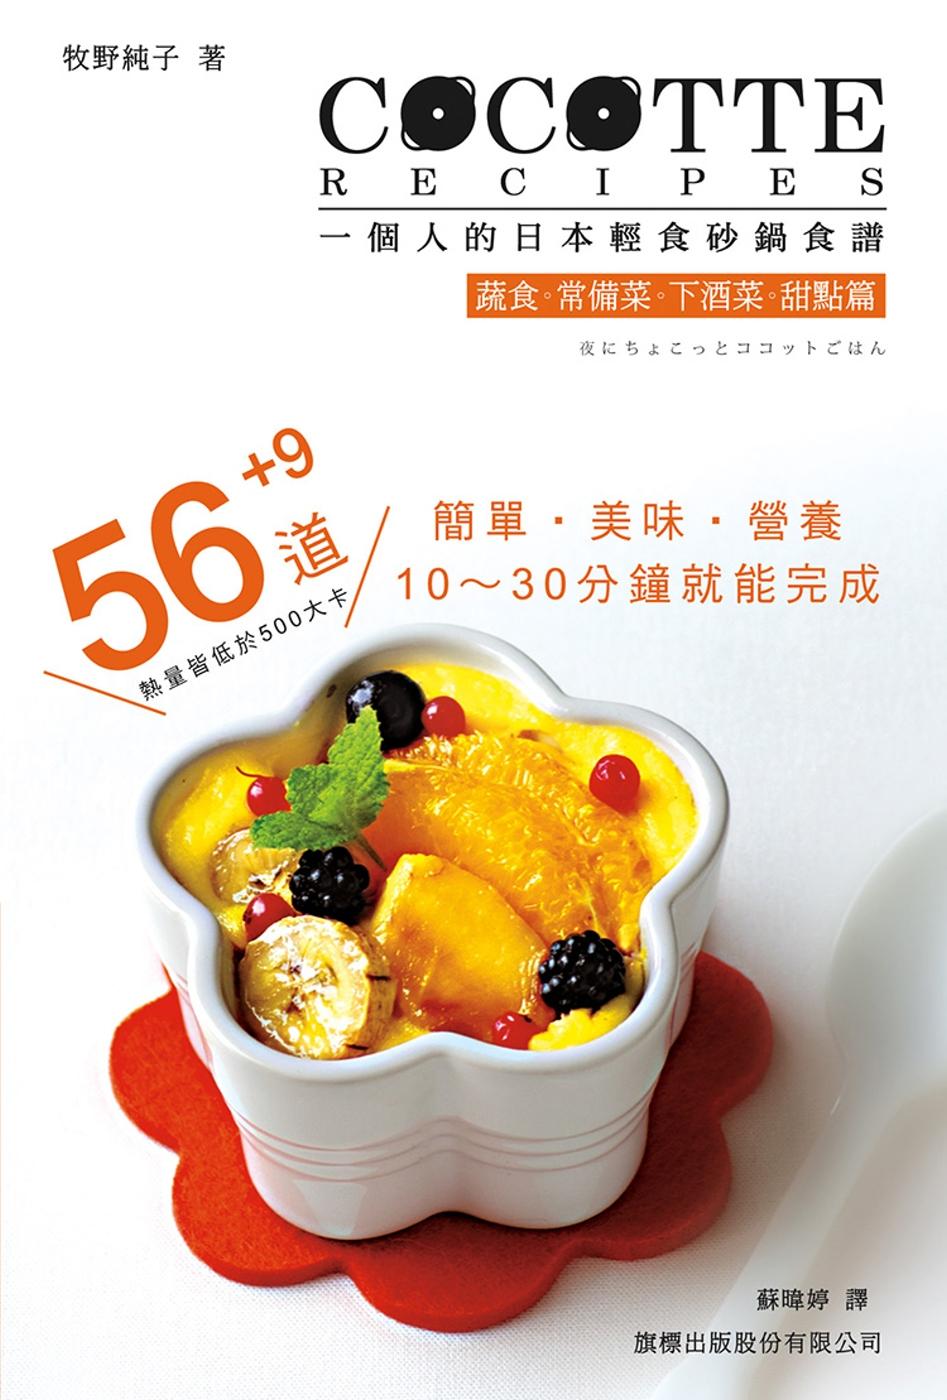 COCOTTE RECIPES 一個人的日本輕食砂鍋食譜:蔬食‧常備菜‧下酒菜‧甜品篇